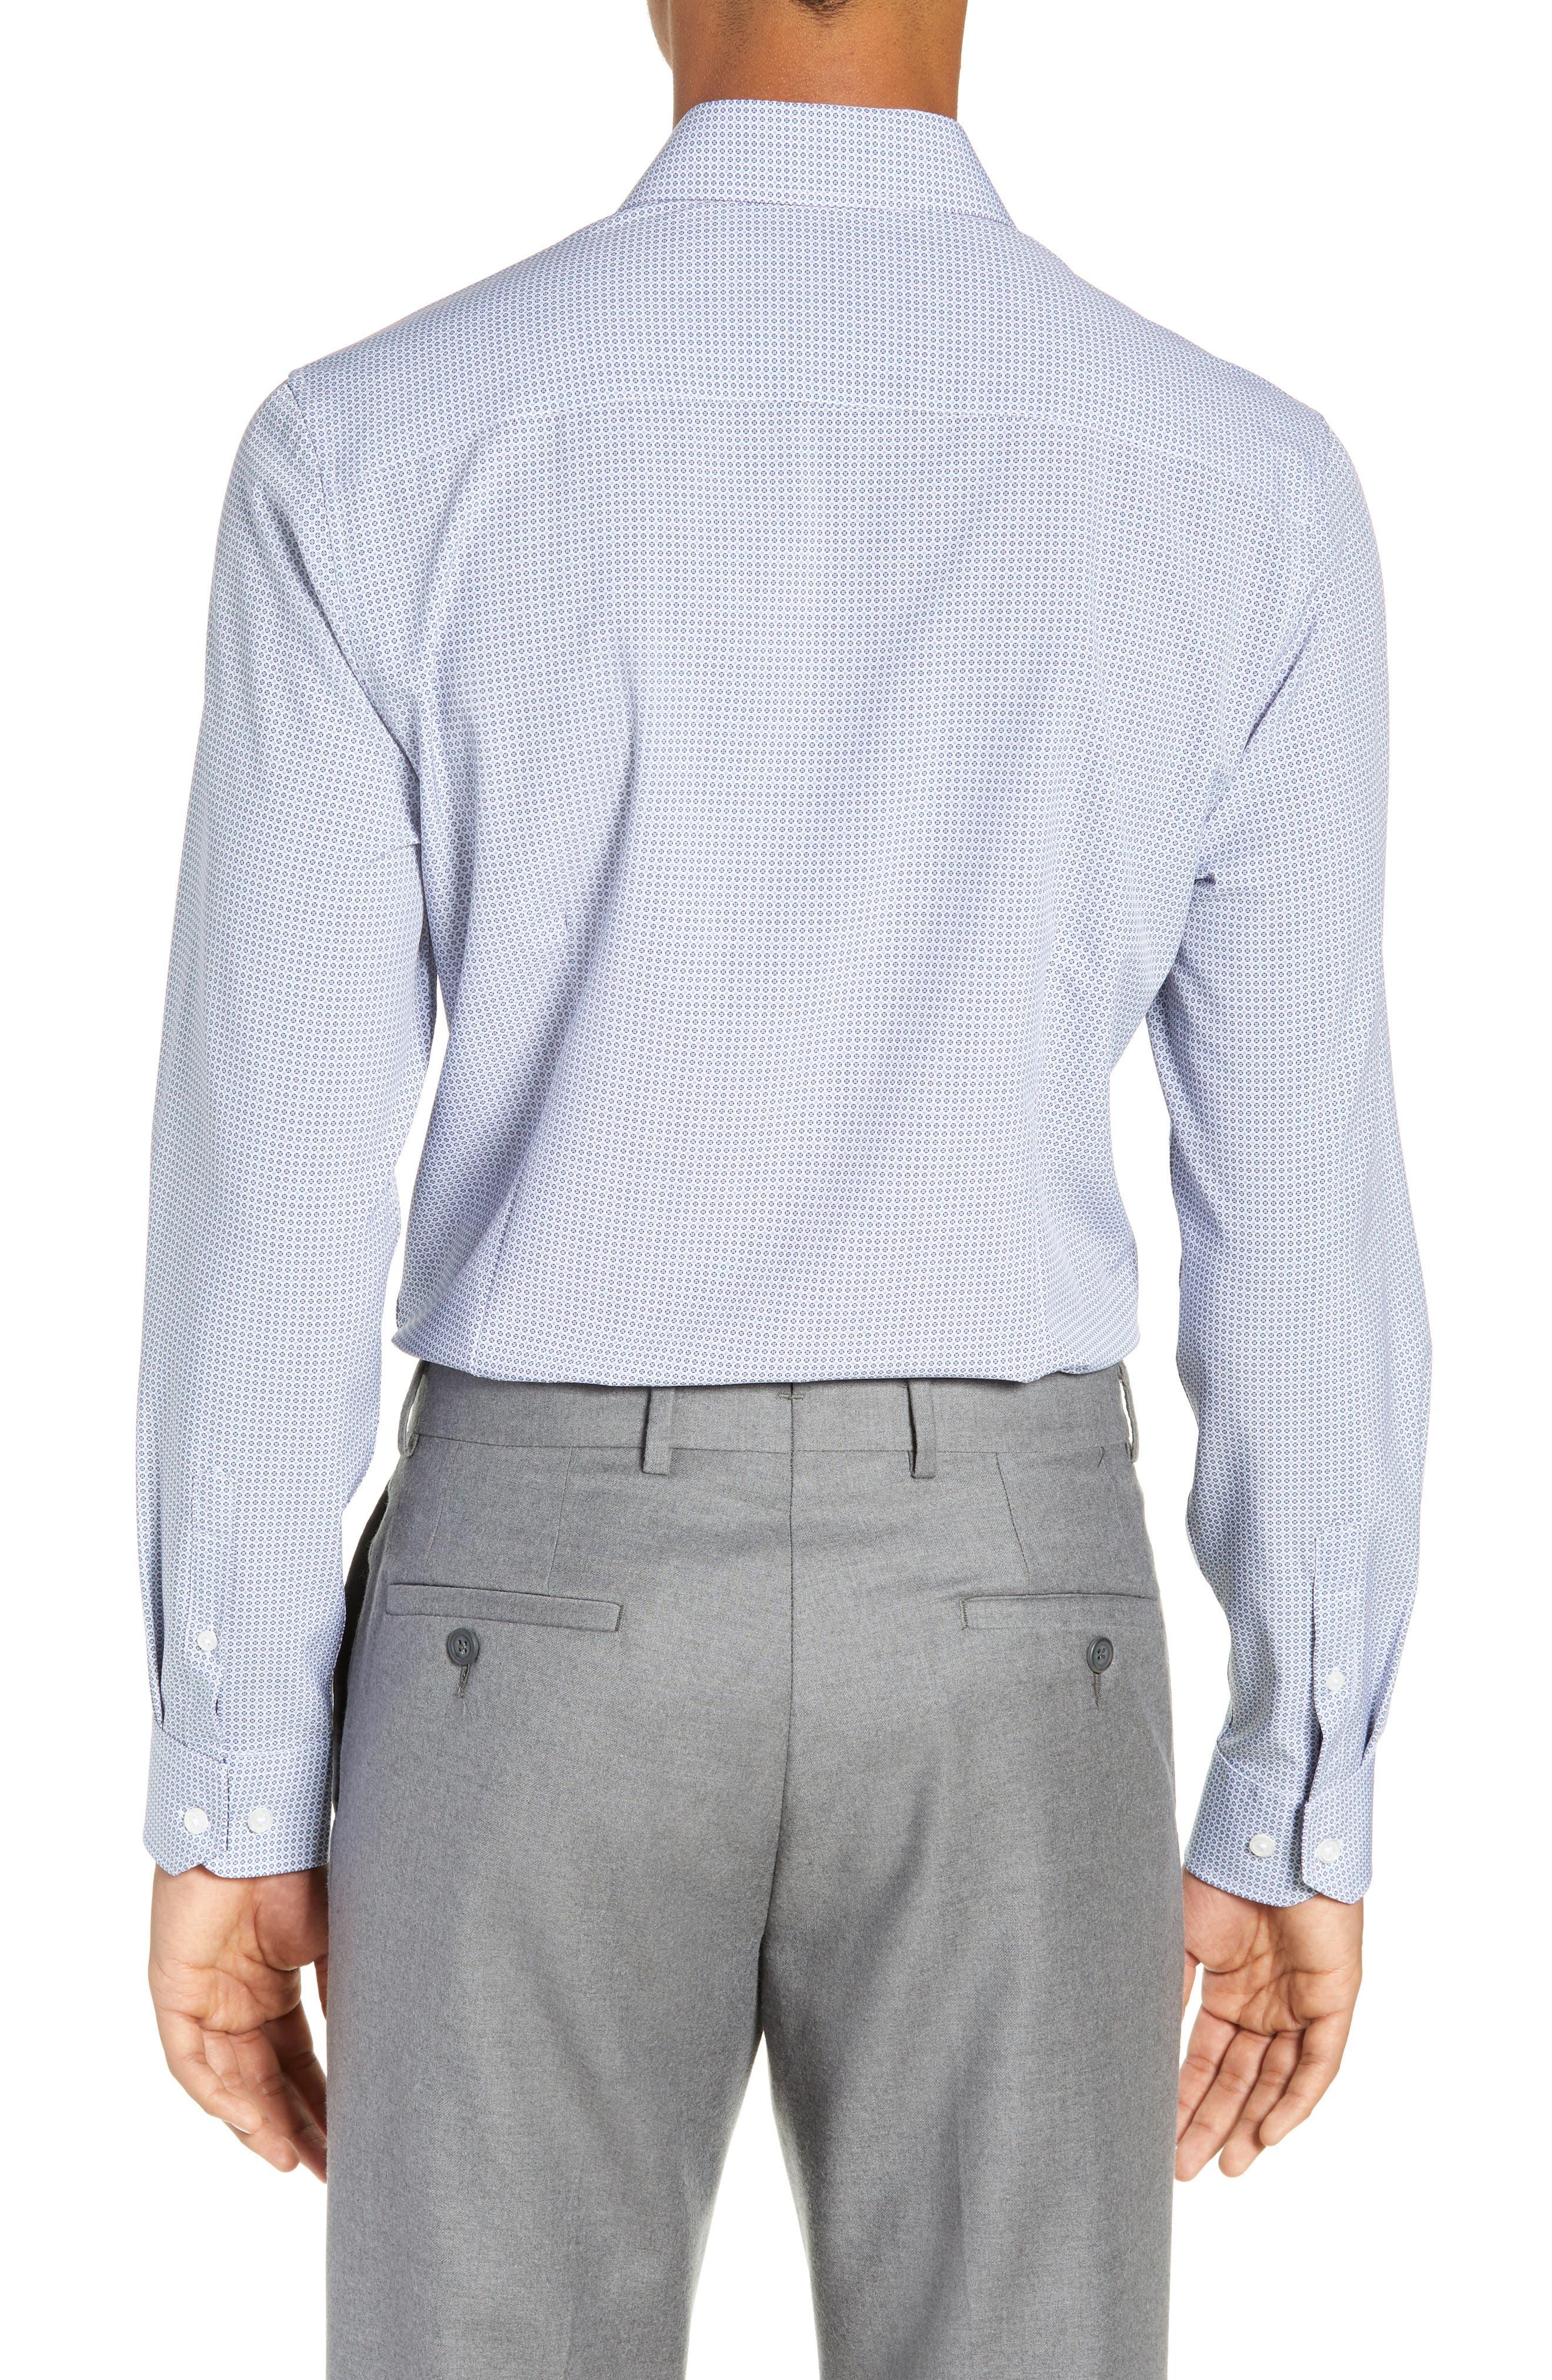 Trim Fit 4-Way Stretch Geometric Dress Shirt,                             Alternate thumbnail 3, color,                             400